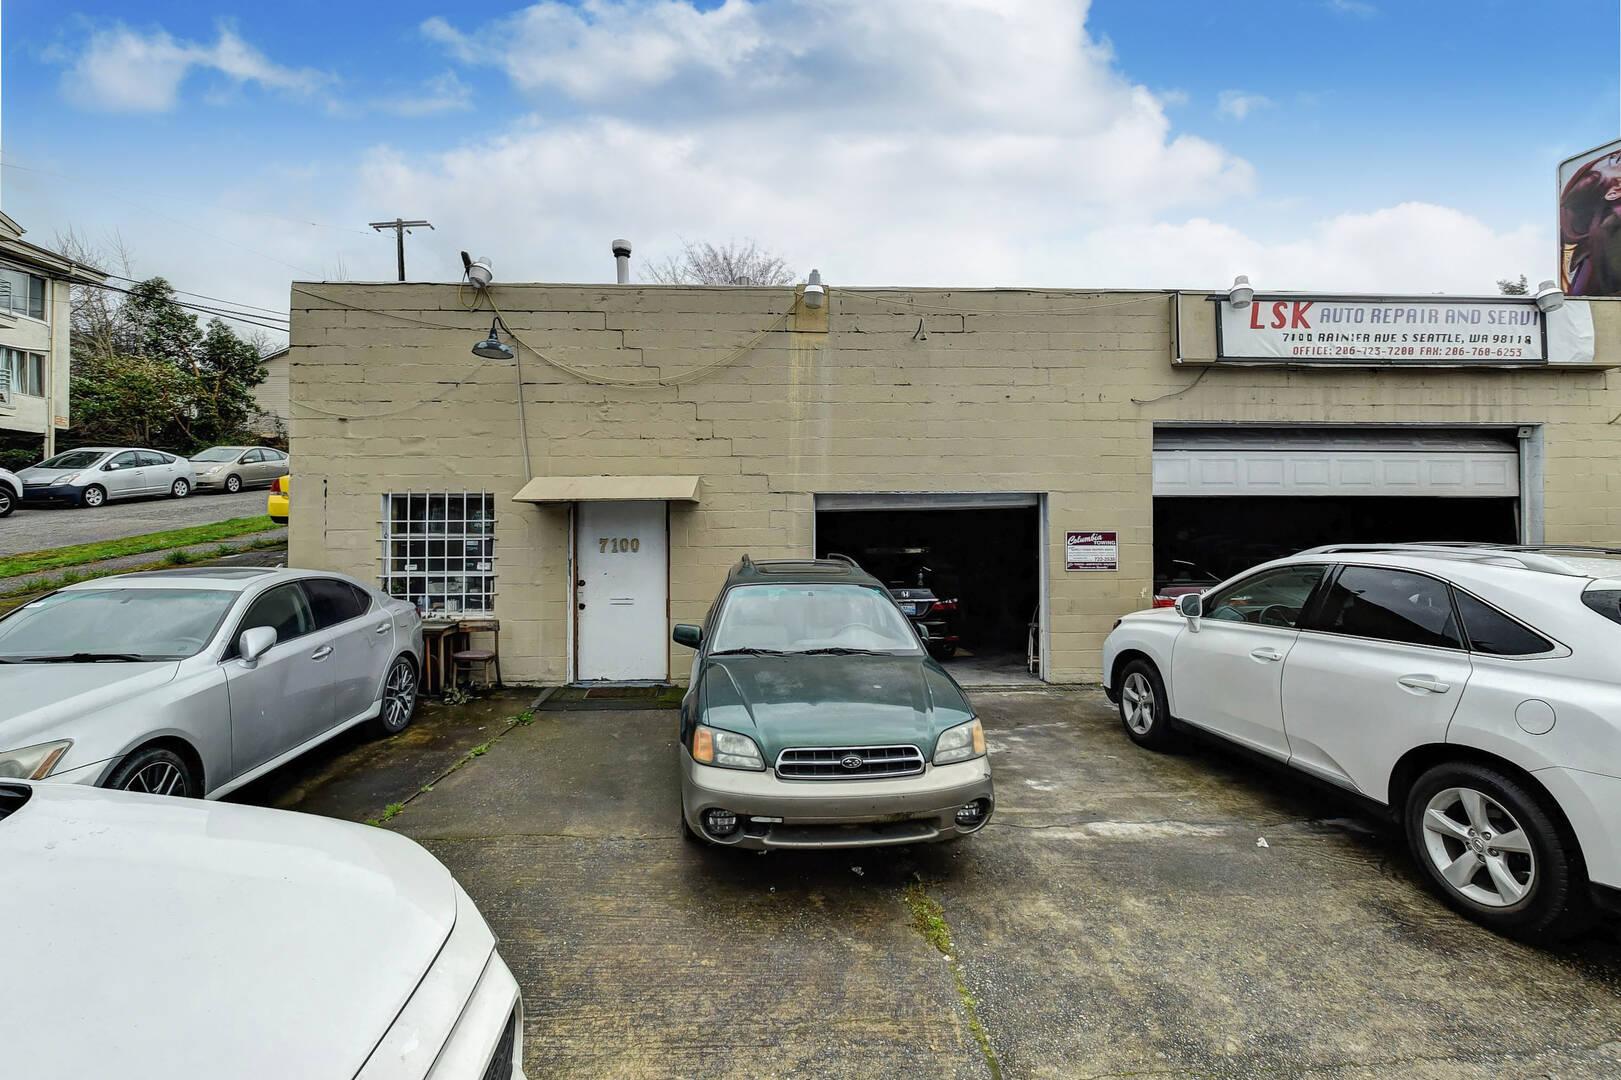 7100 Rainier Ave S Seattle, WA 98118